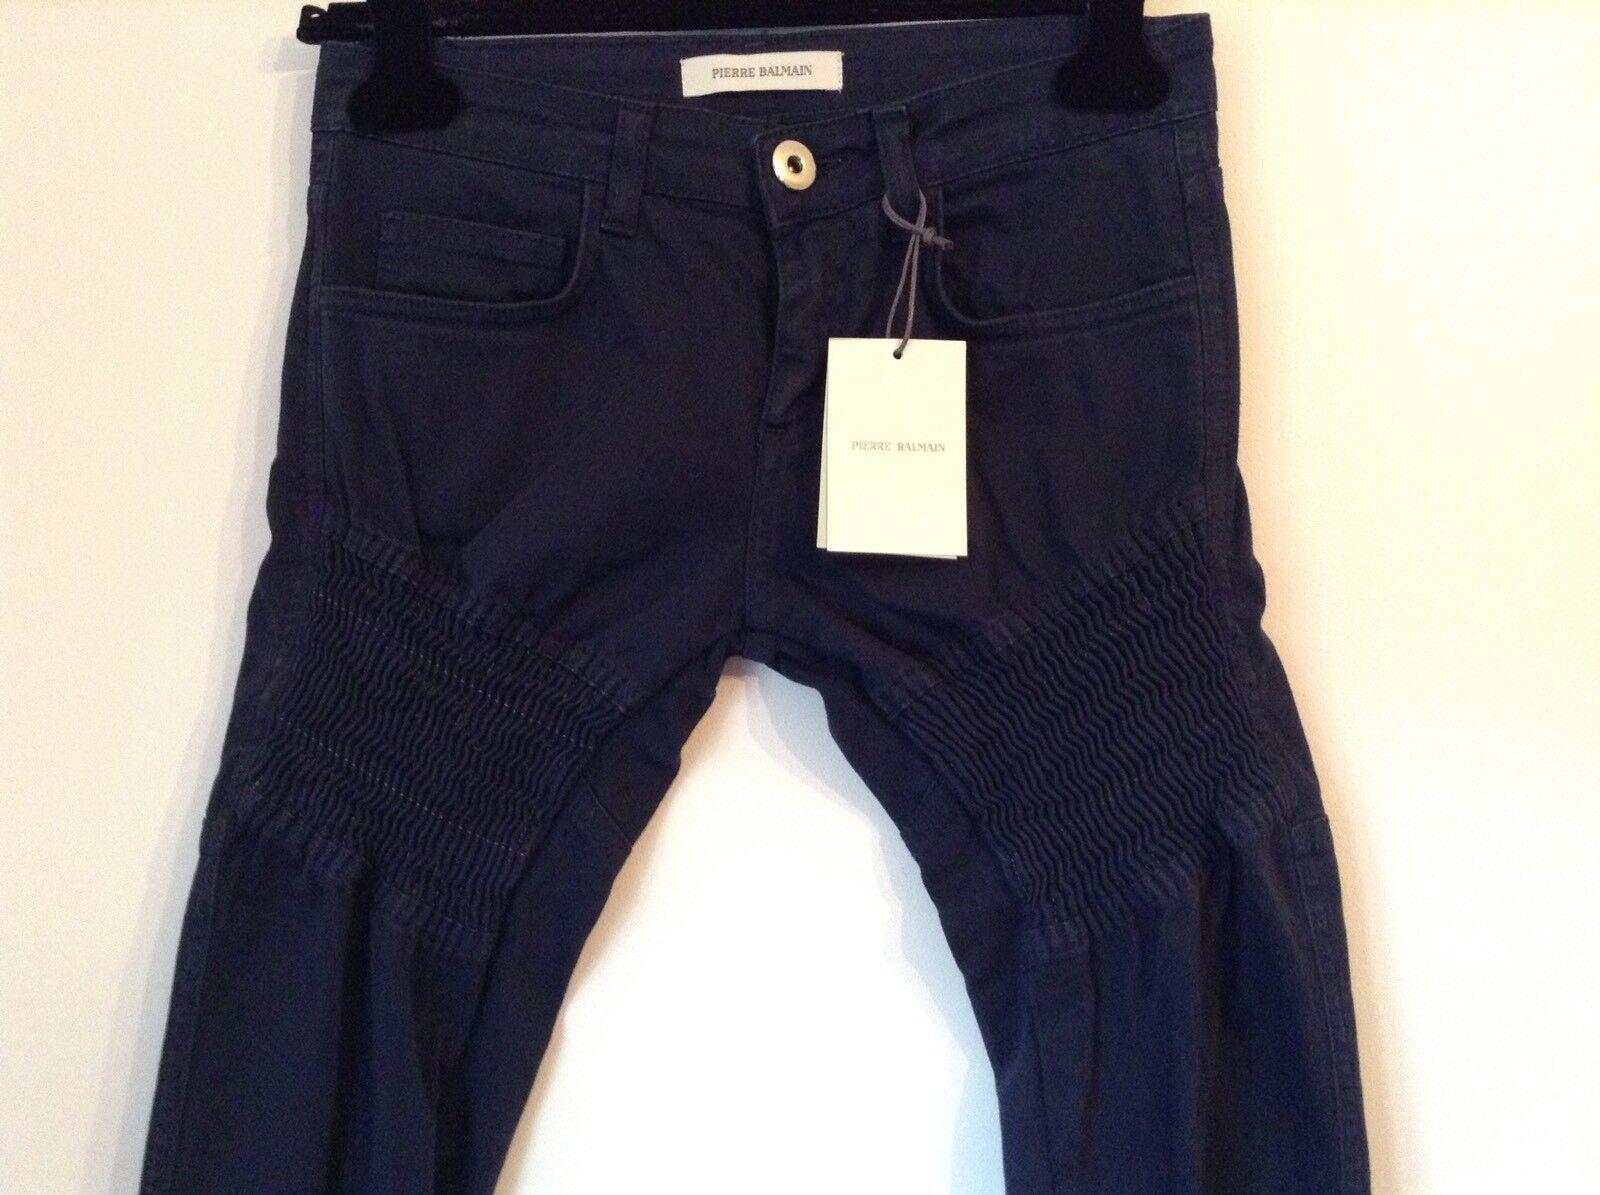 BNWT 100% auth BALMAIN Ladies Blau Slim Fit Biker Jeans. 28   UK 10